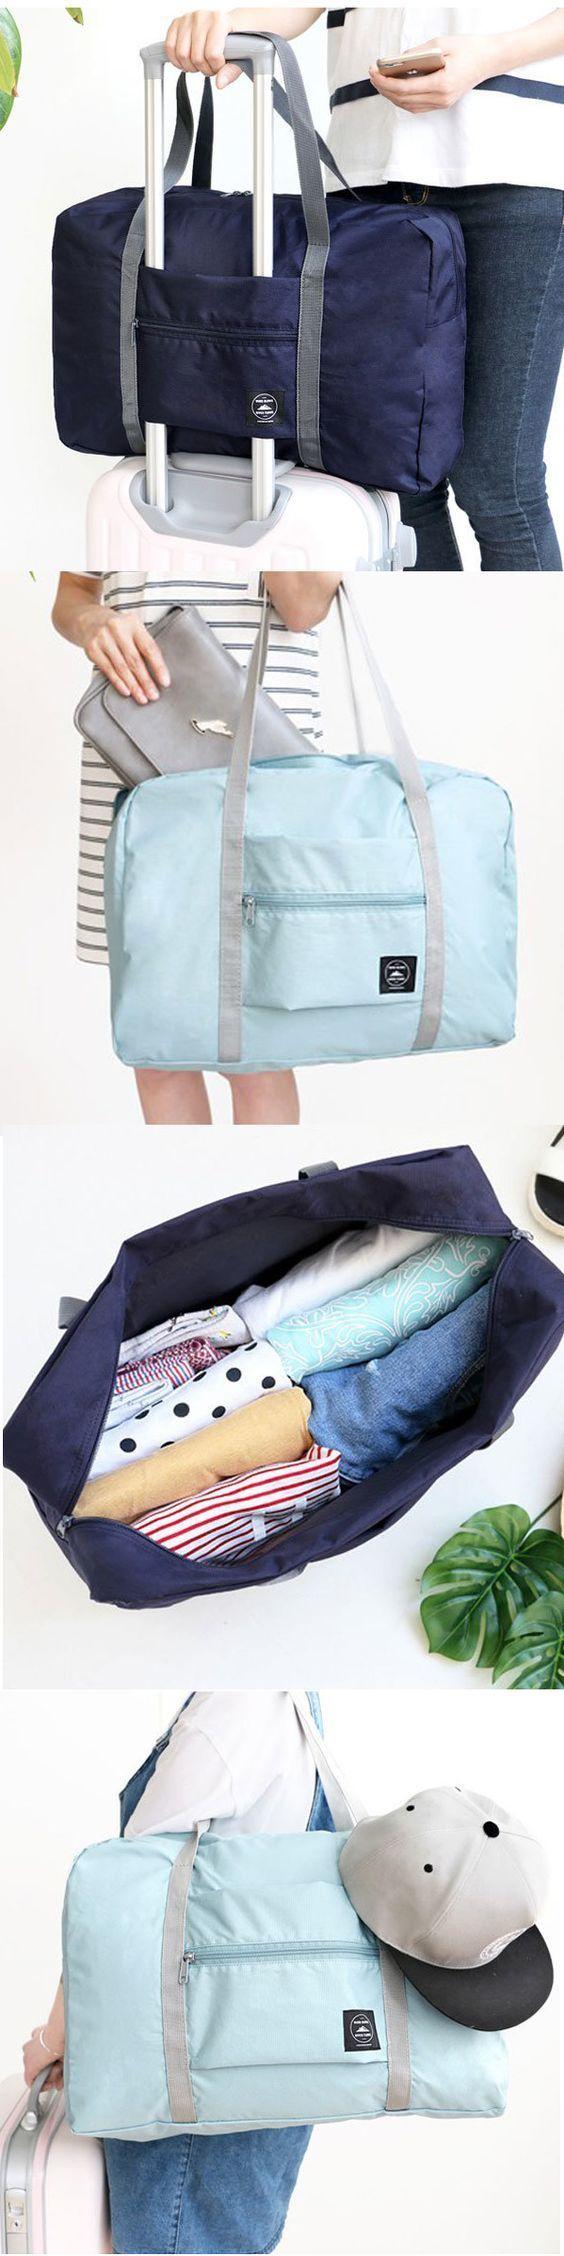 $5.99 Large Travel Bag Waterproof Storage Bag Luggage Folding Handbag Shoulder Bag Storage Containers http://amzn.to/2tCQA3t